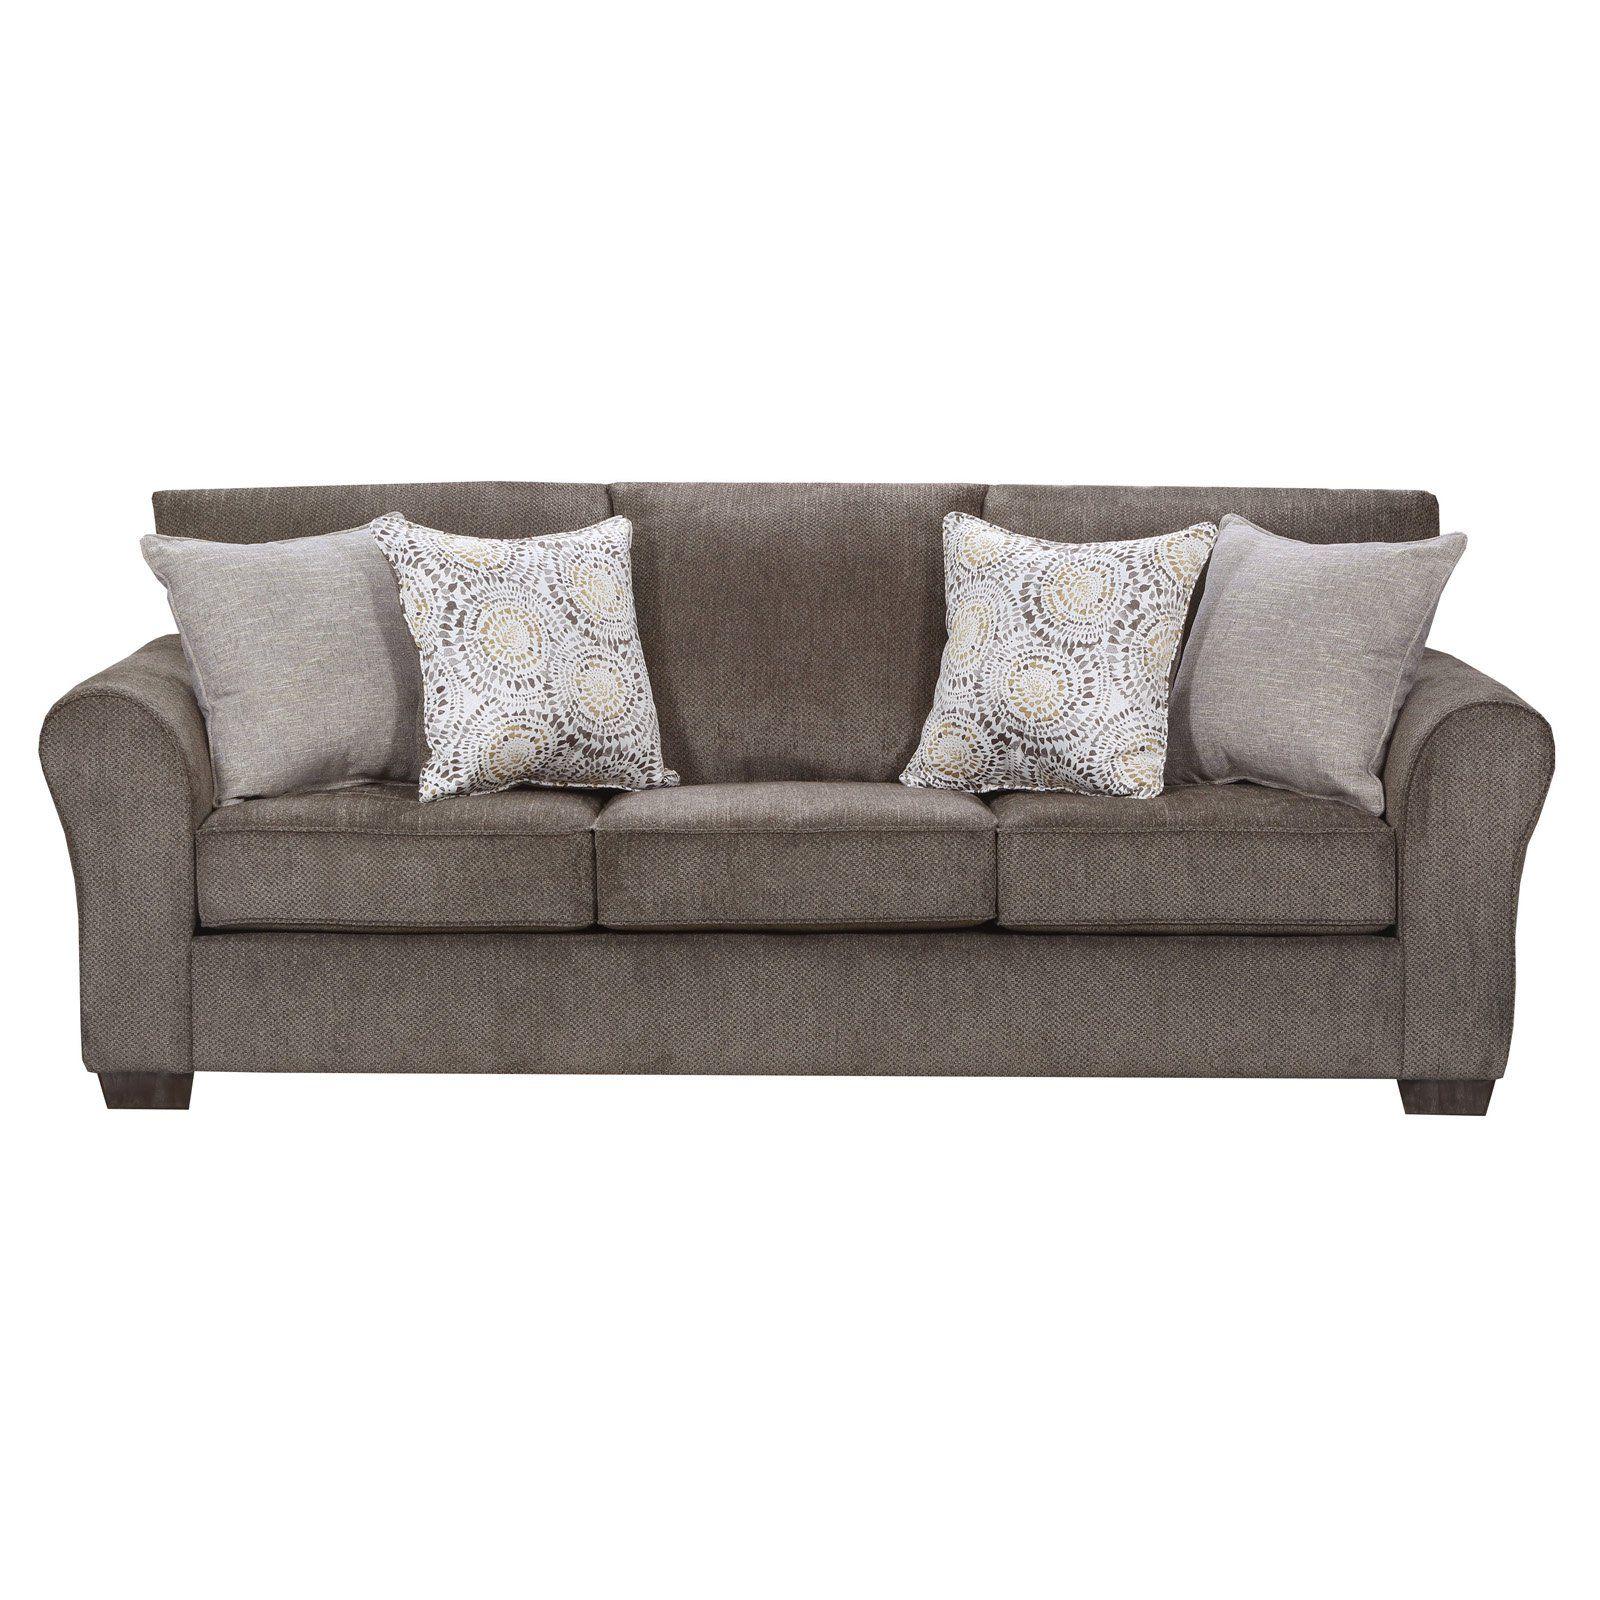 Simmons Upholstery Harlow Queen Sleeper Sofa Upholstery